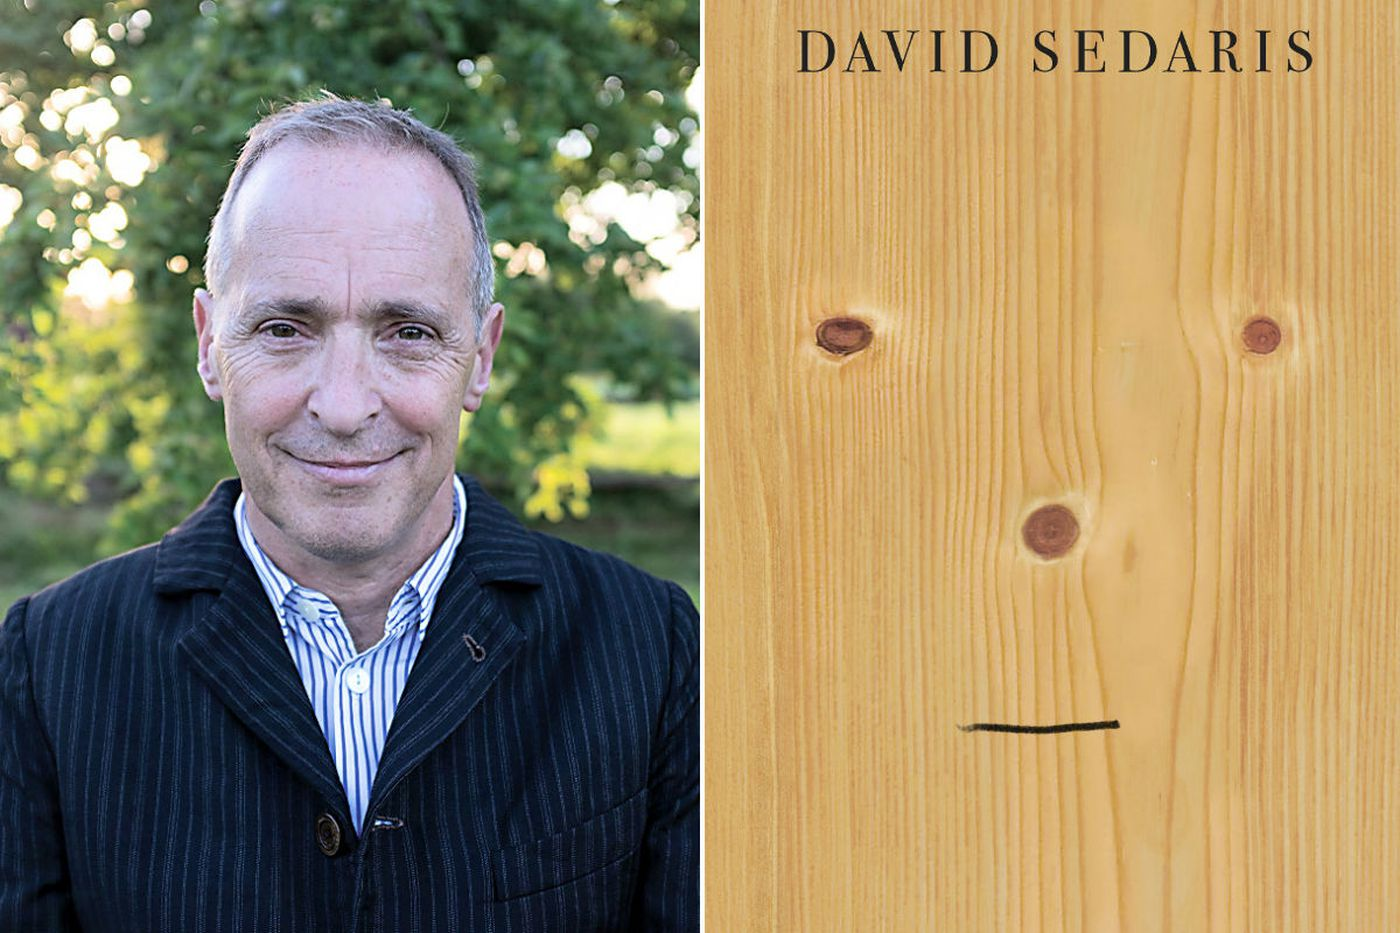 David sedaris calypso essays of humor melancholy and family